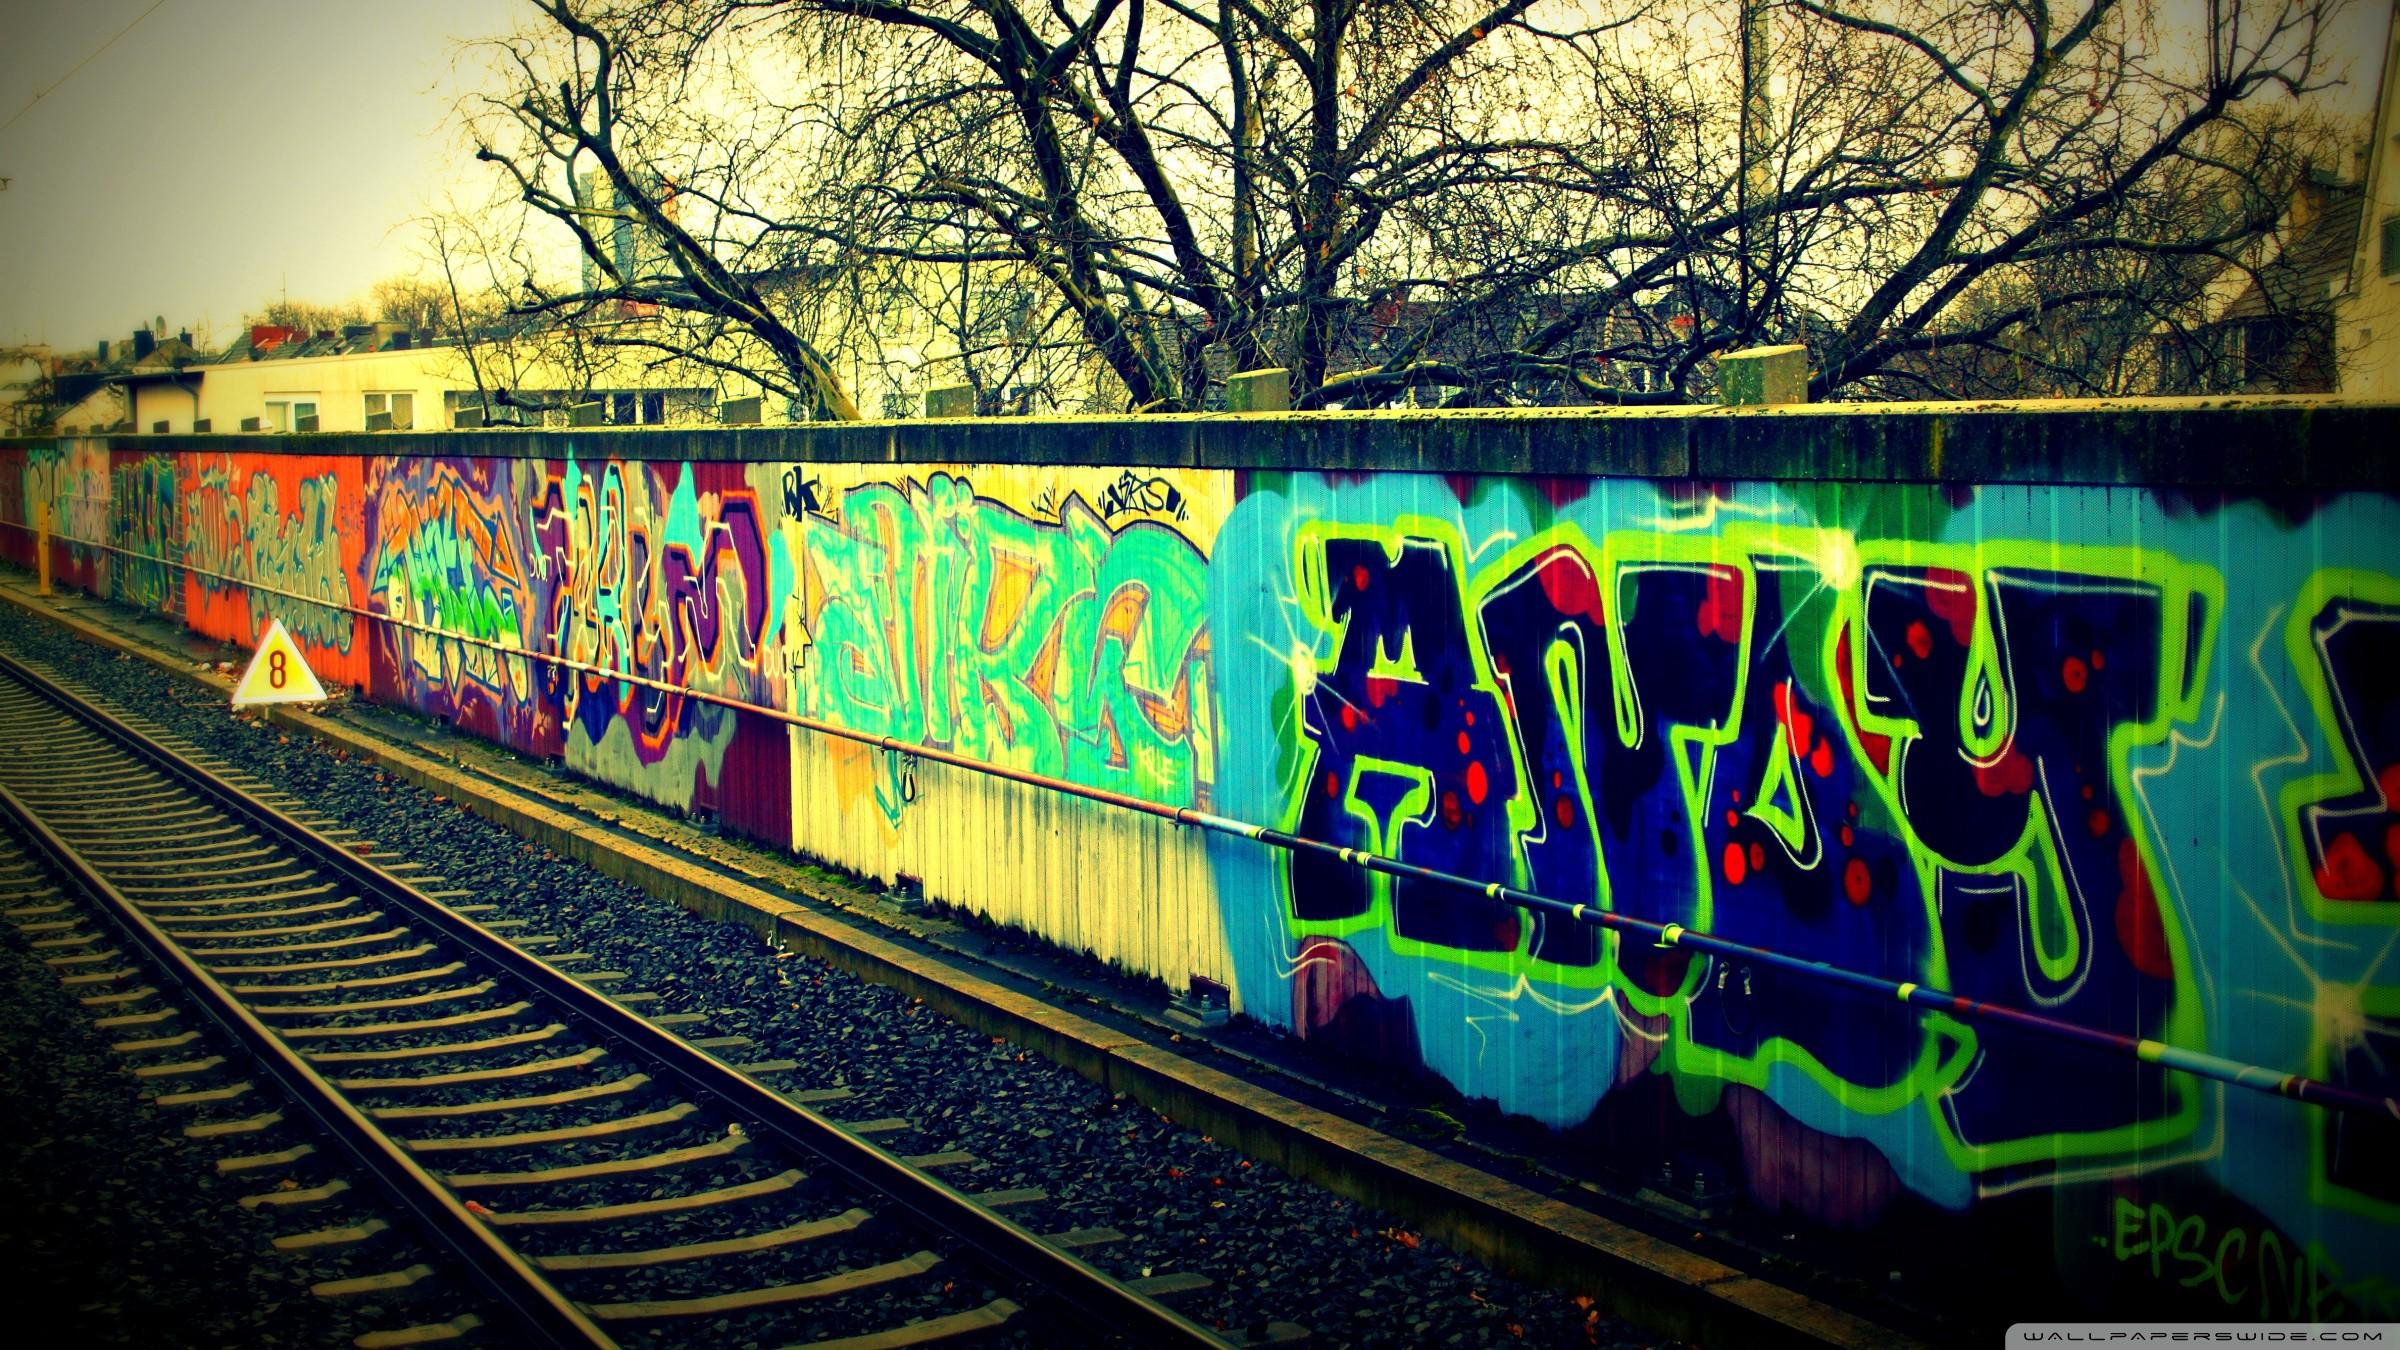 Seriously Rough Urban Wallpaper Creative CanCreative Can · Train TracksDesktop  …